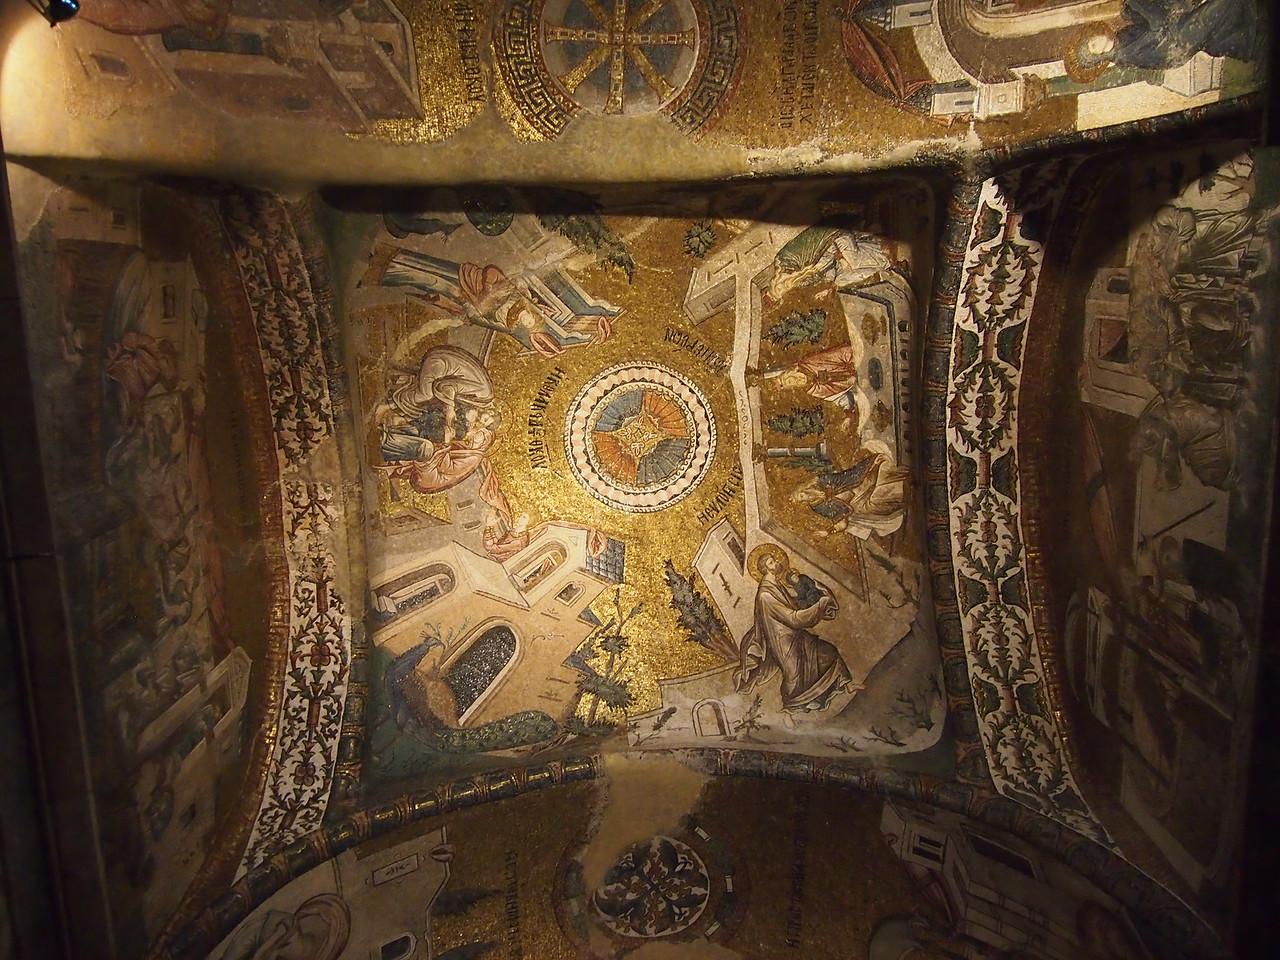 Mosaics and frescoes at the Chora Church/Kariye Museum